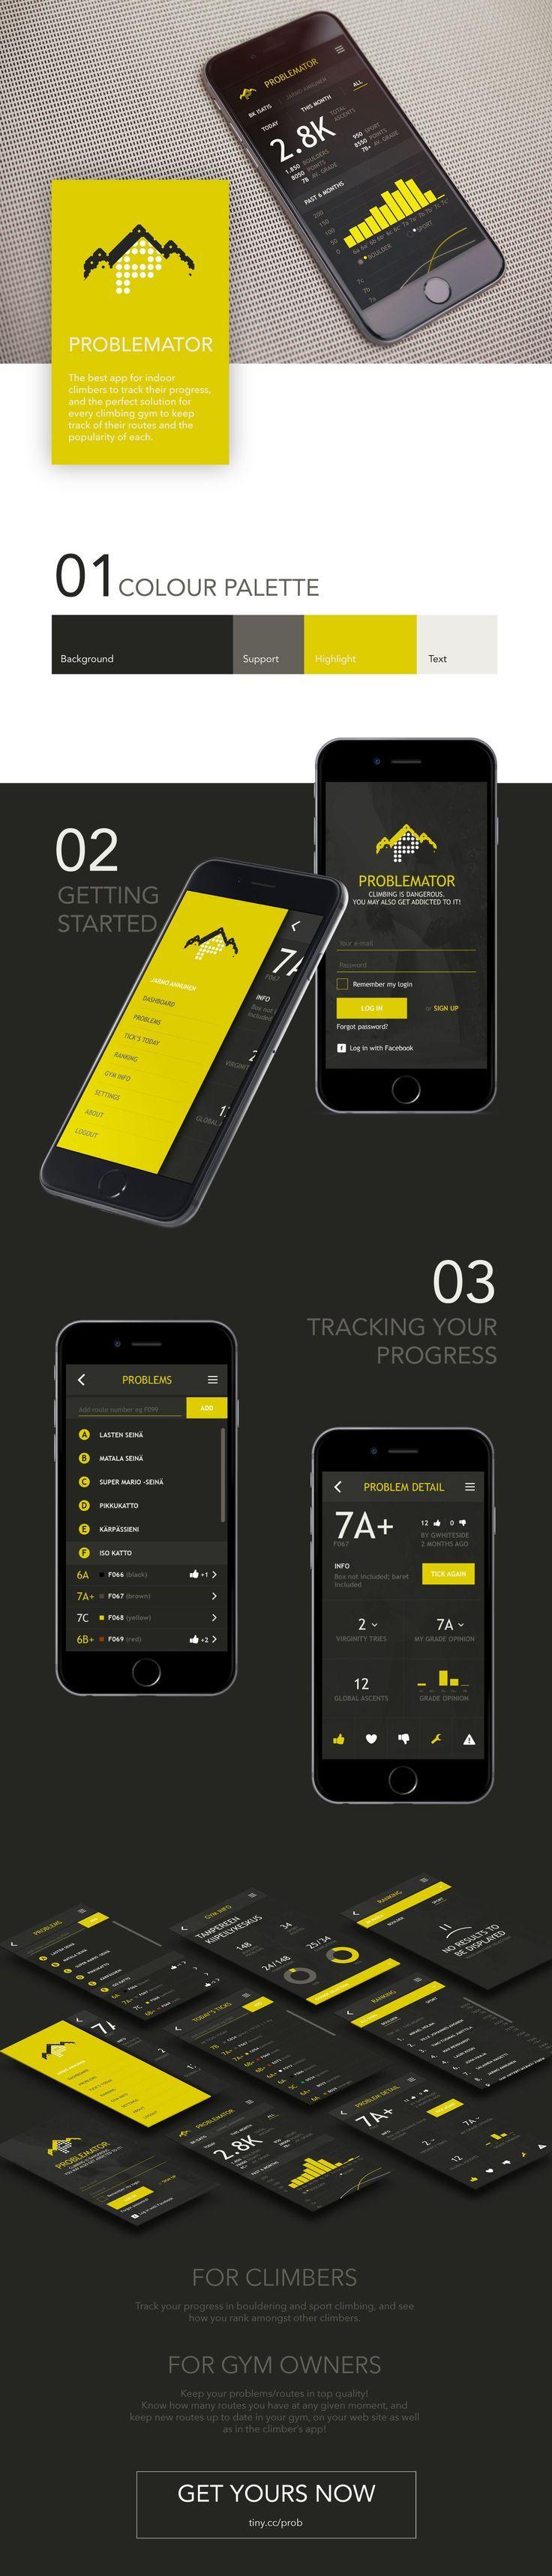 Problemator // mobile app to track climbers progress. www.sabrinaseidl.com #bouldering #climbing #sport